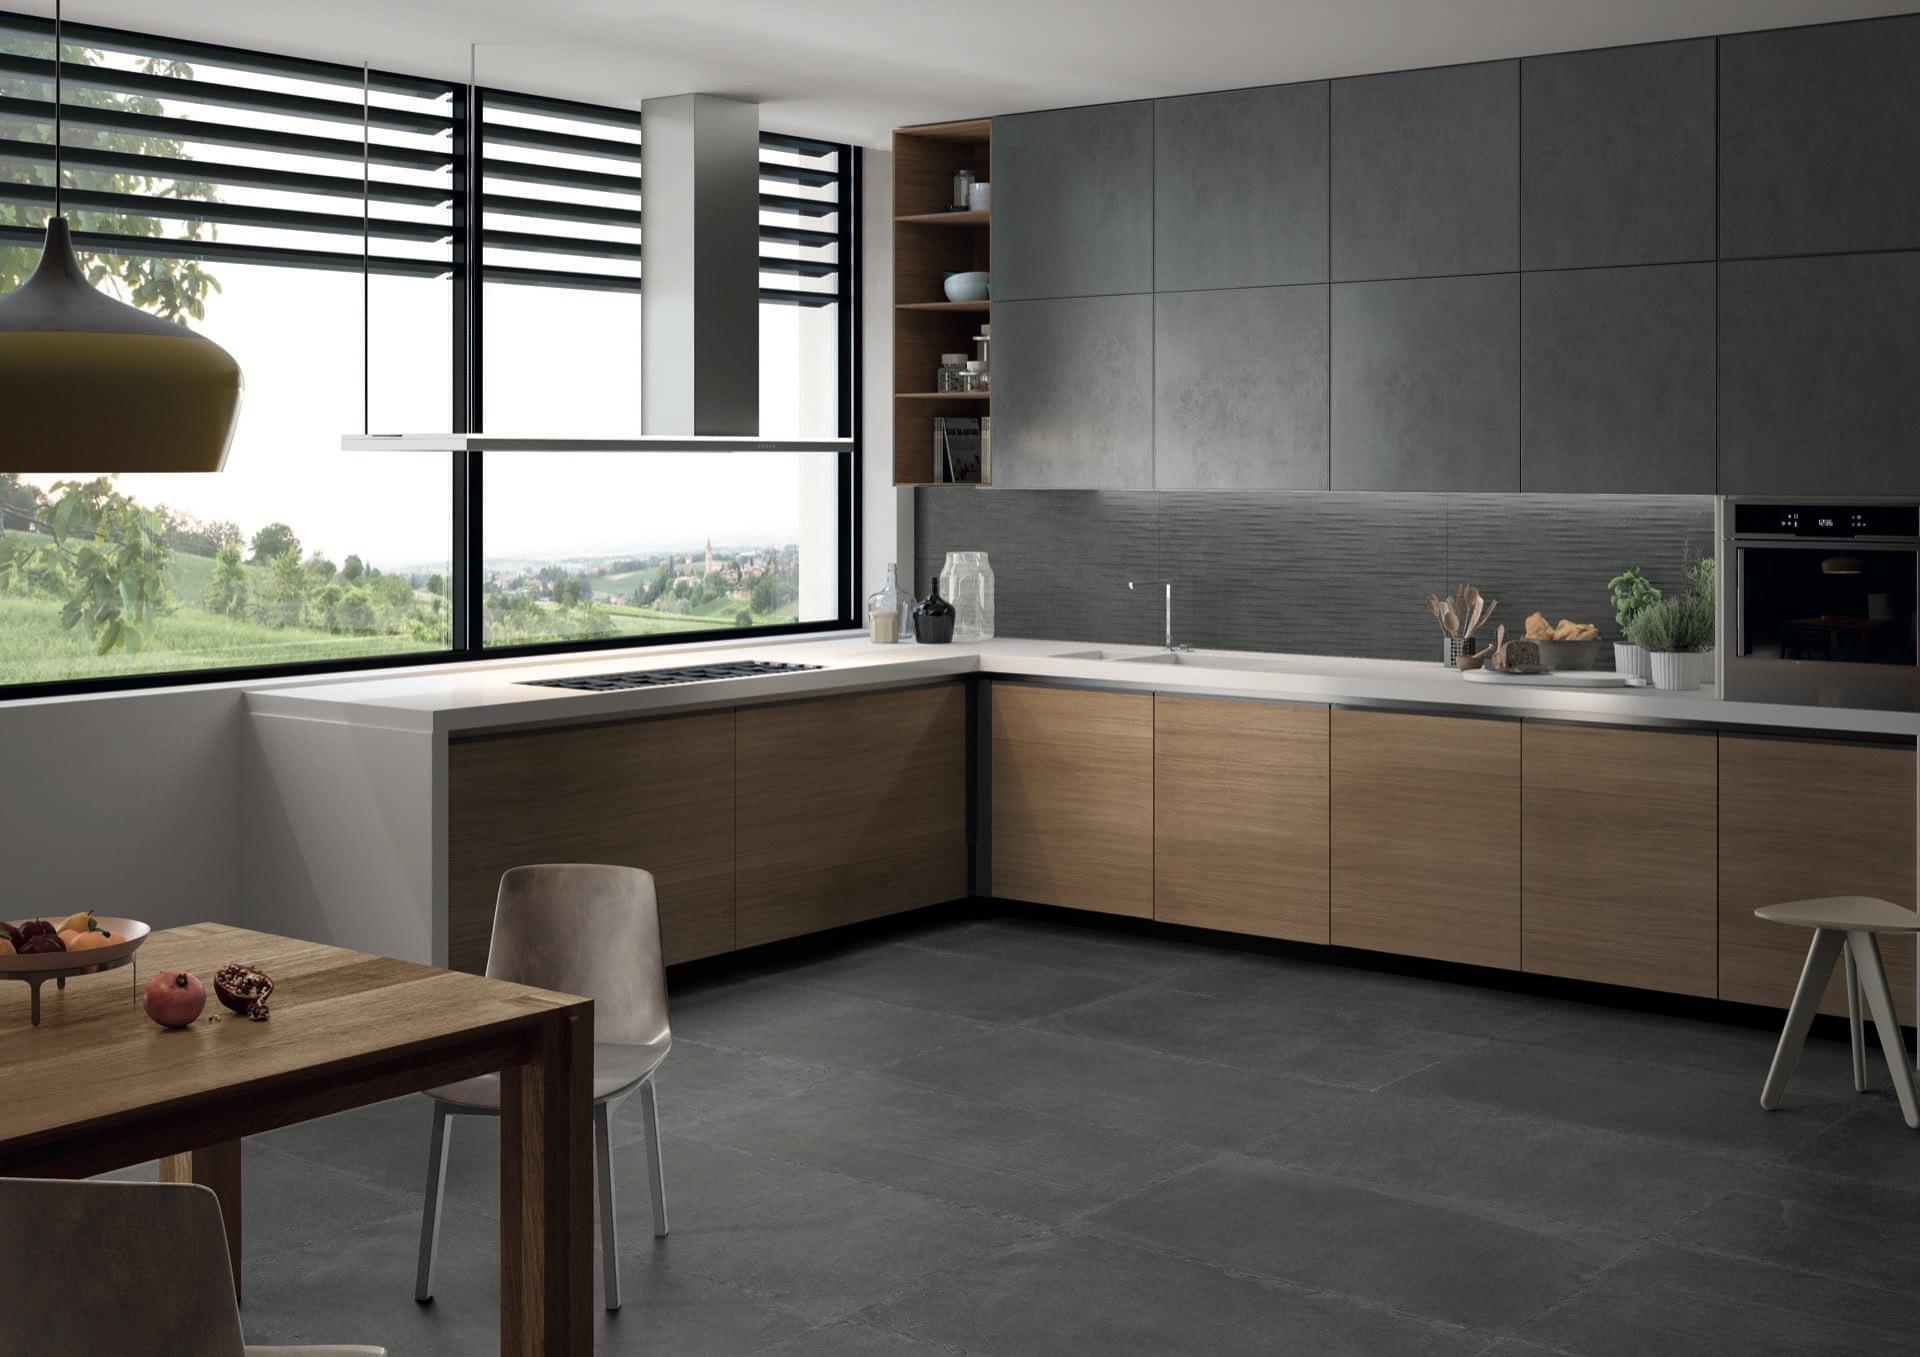 Limestone Dark Nat 30x120-30x120 Parallelo Amb Cucina